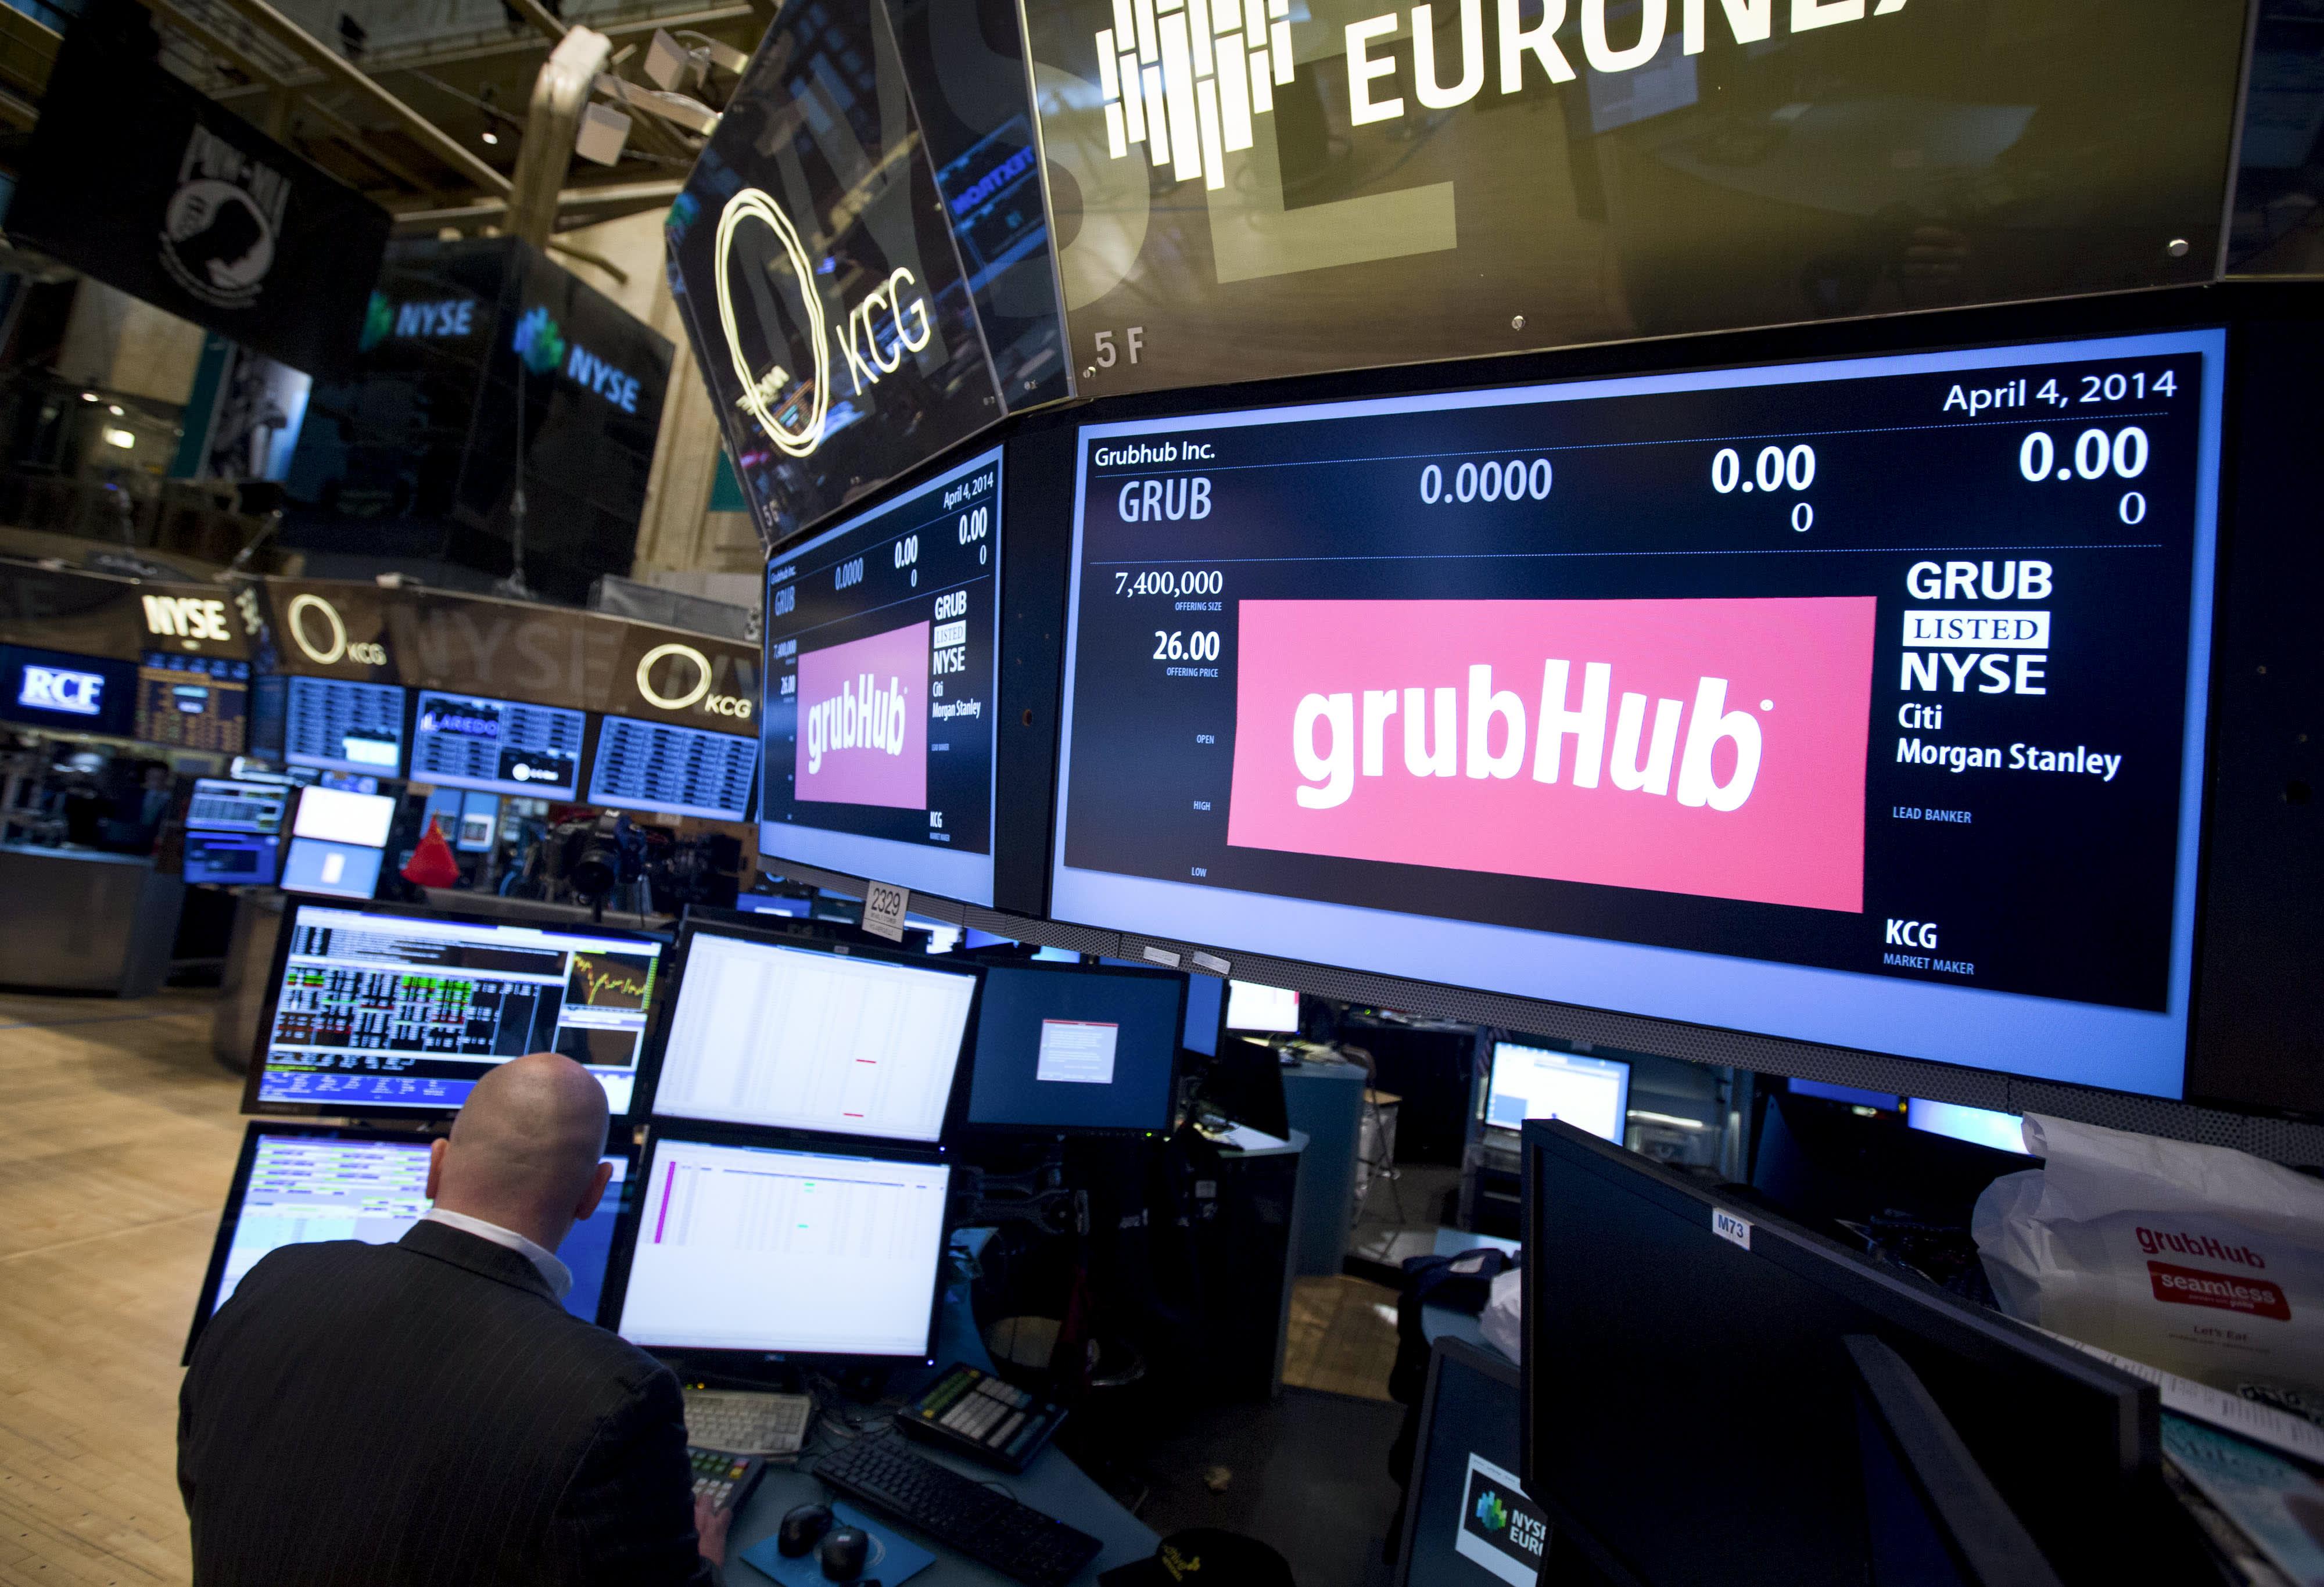 Grubhub, Casper Sleep, BlackRock, Datadog and more